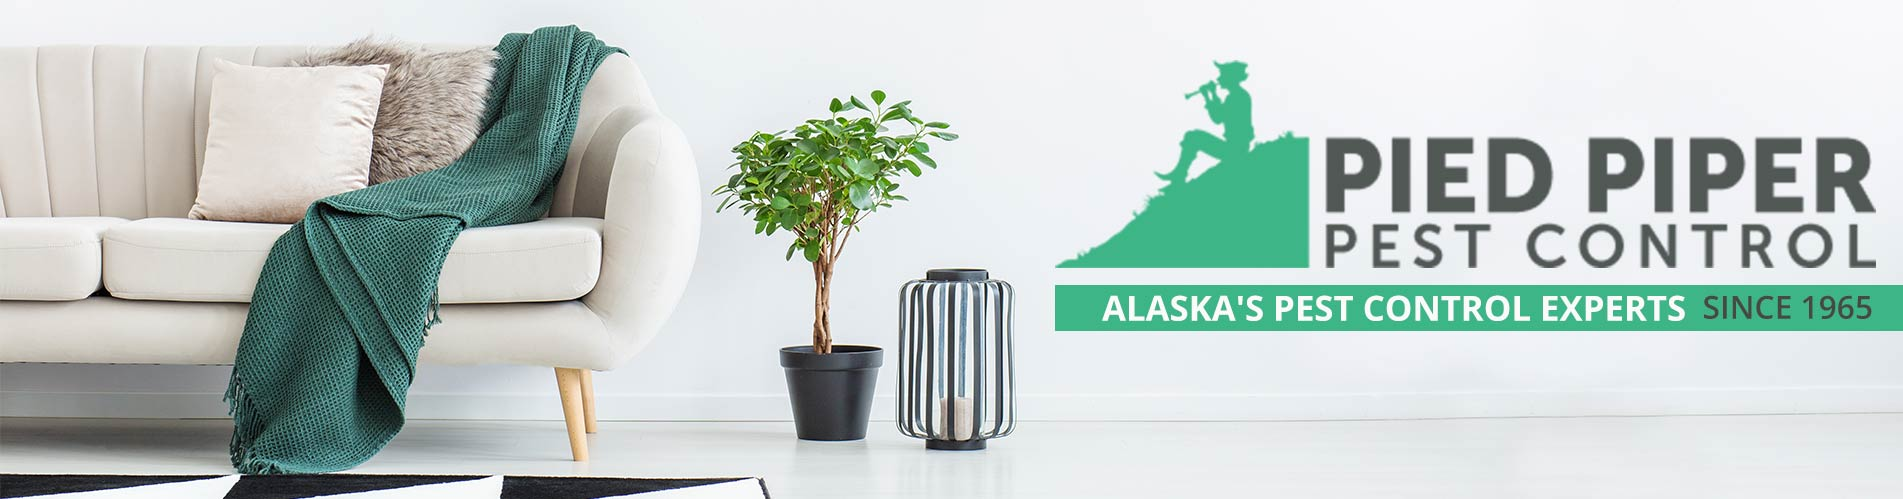 Pest Control Company in Alaska | Pest Inspection Service